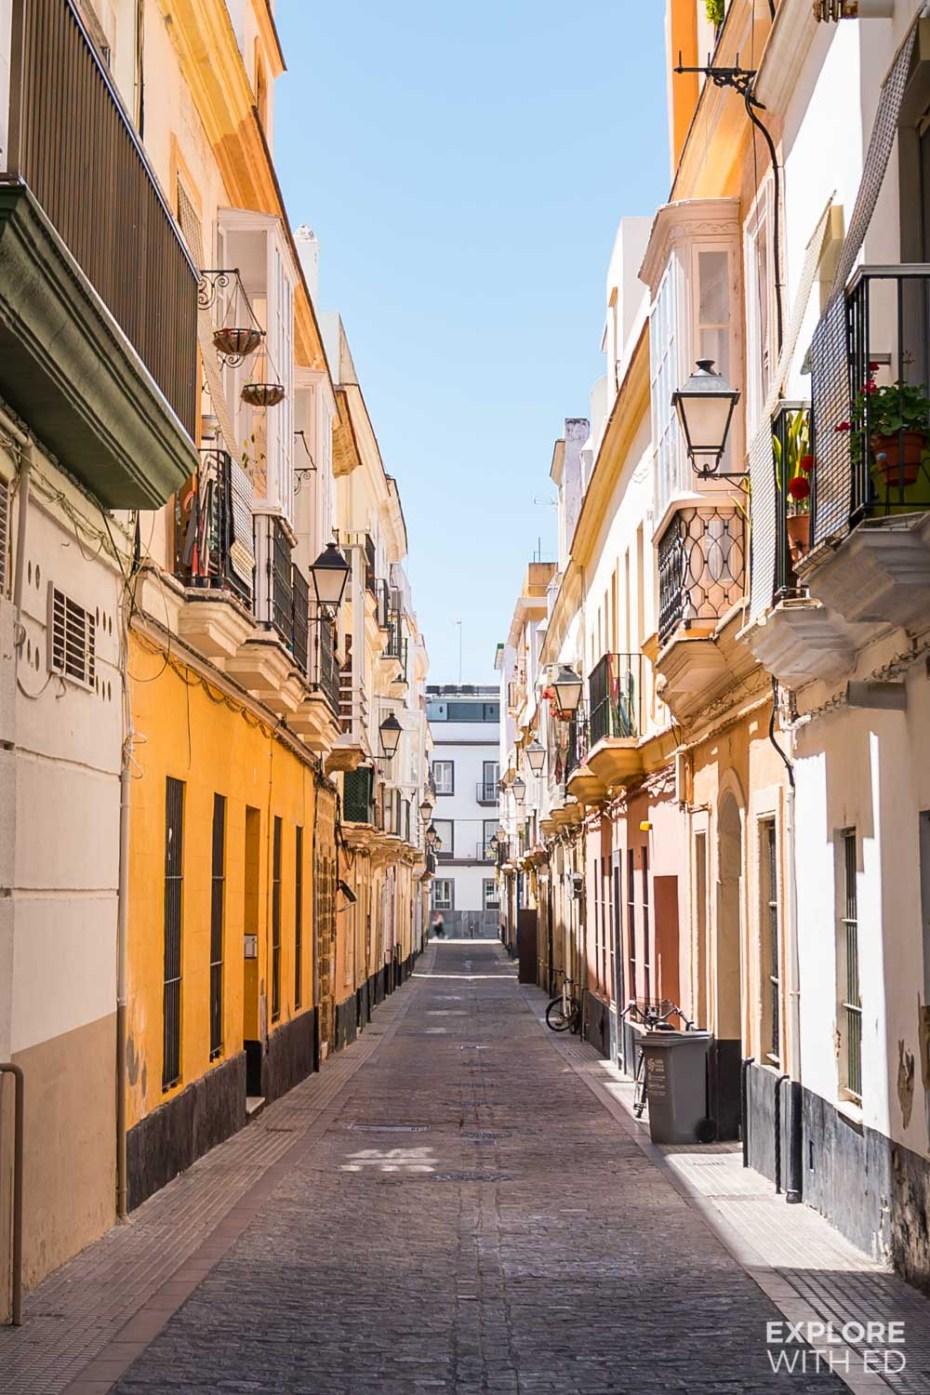 The narrow side streets of Cadiz, Spain